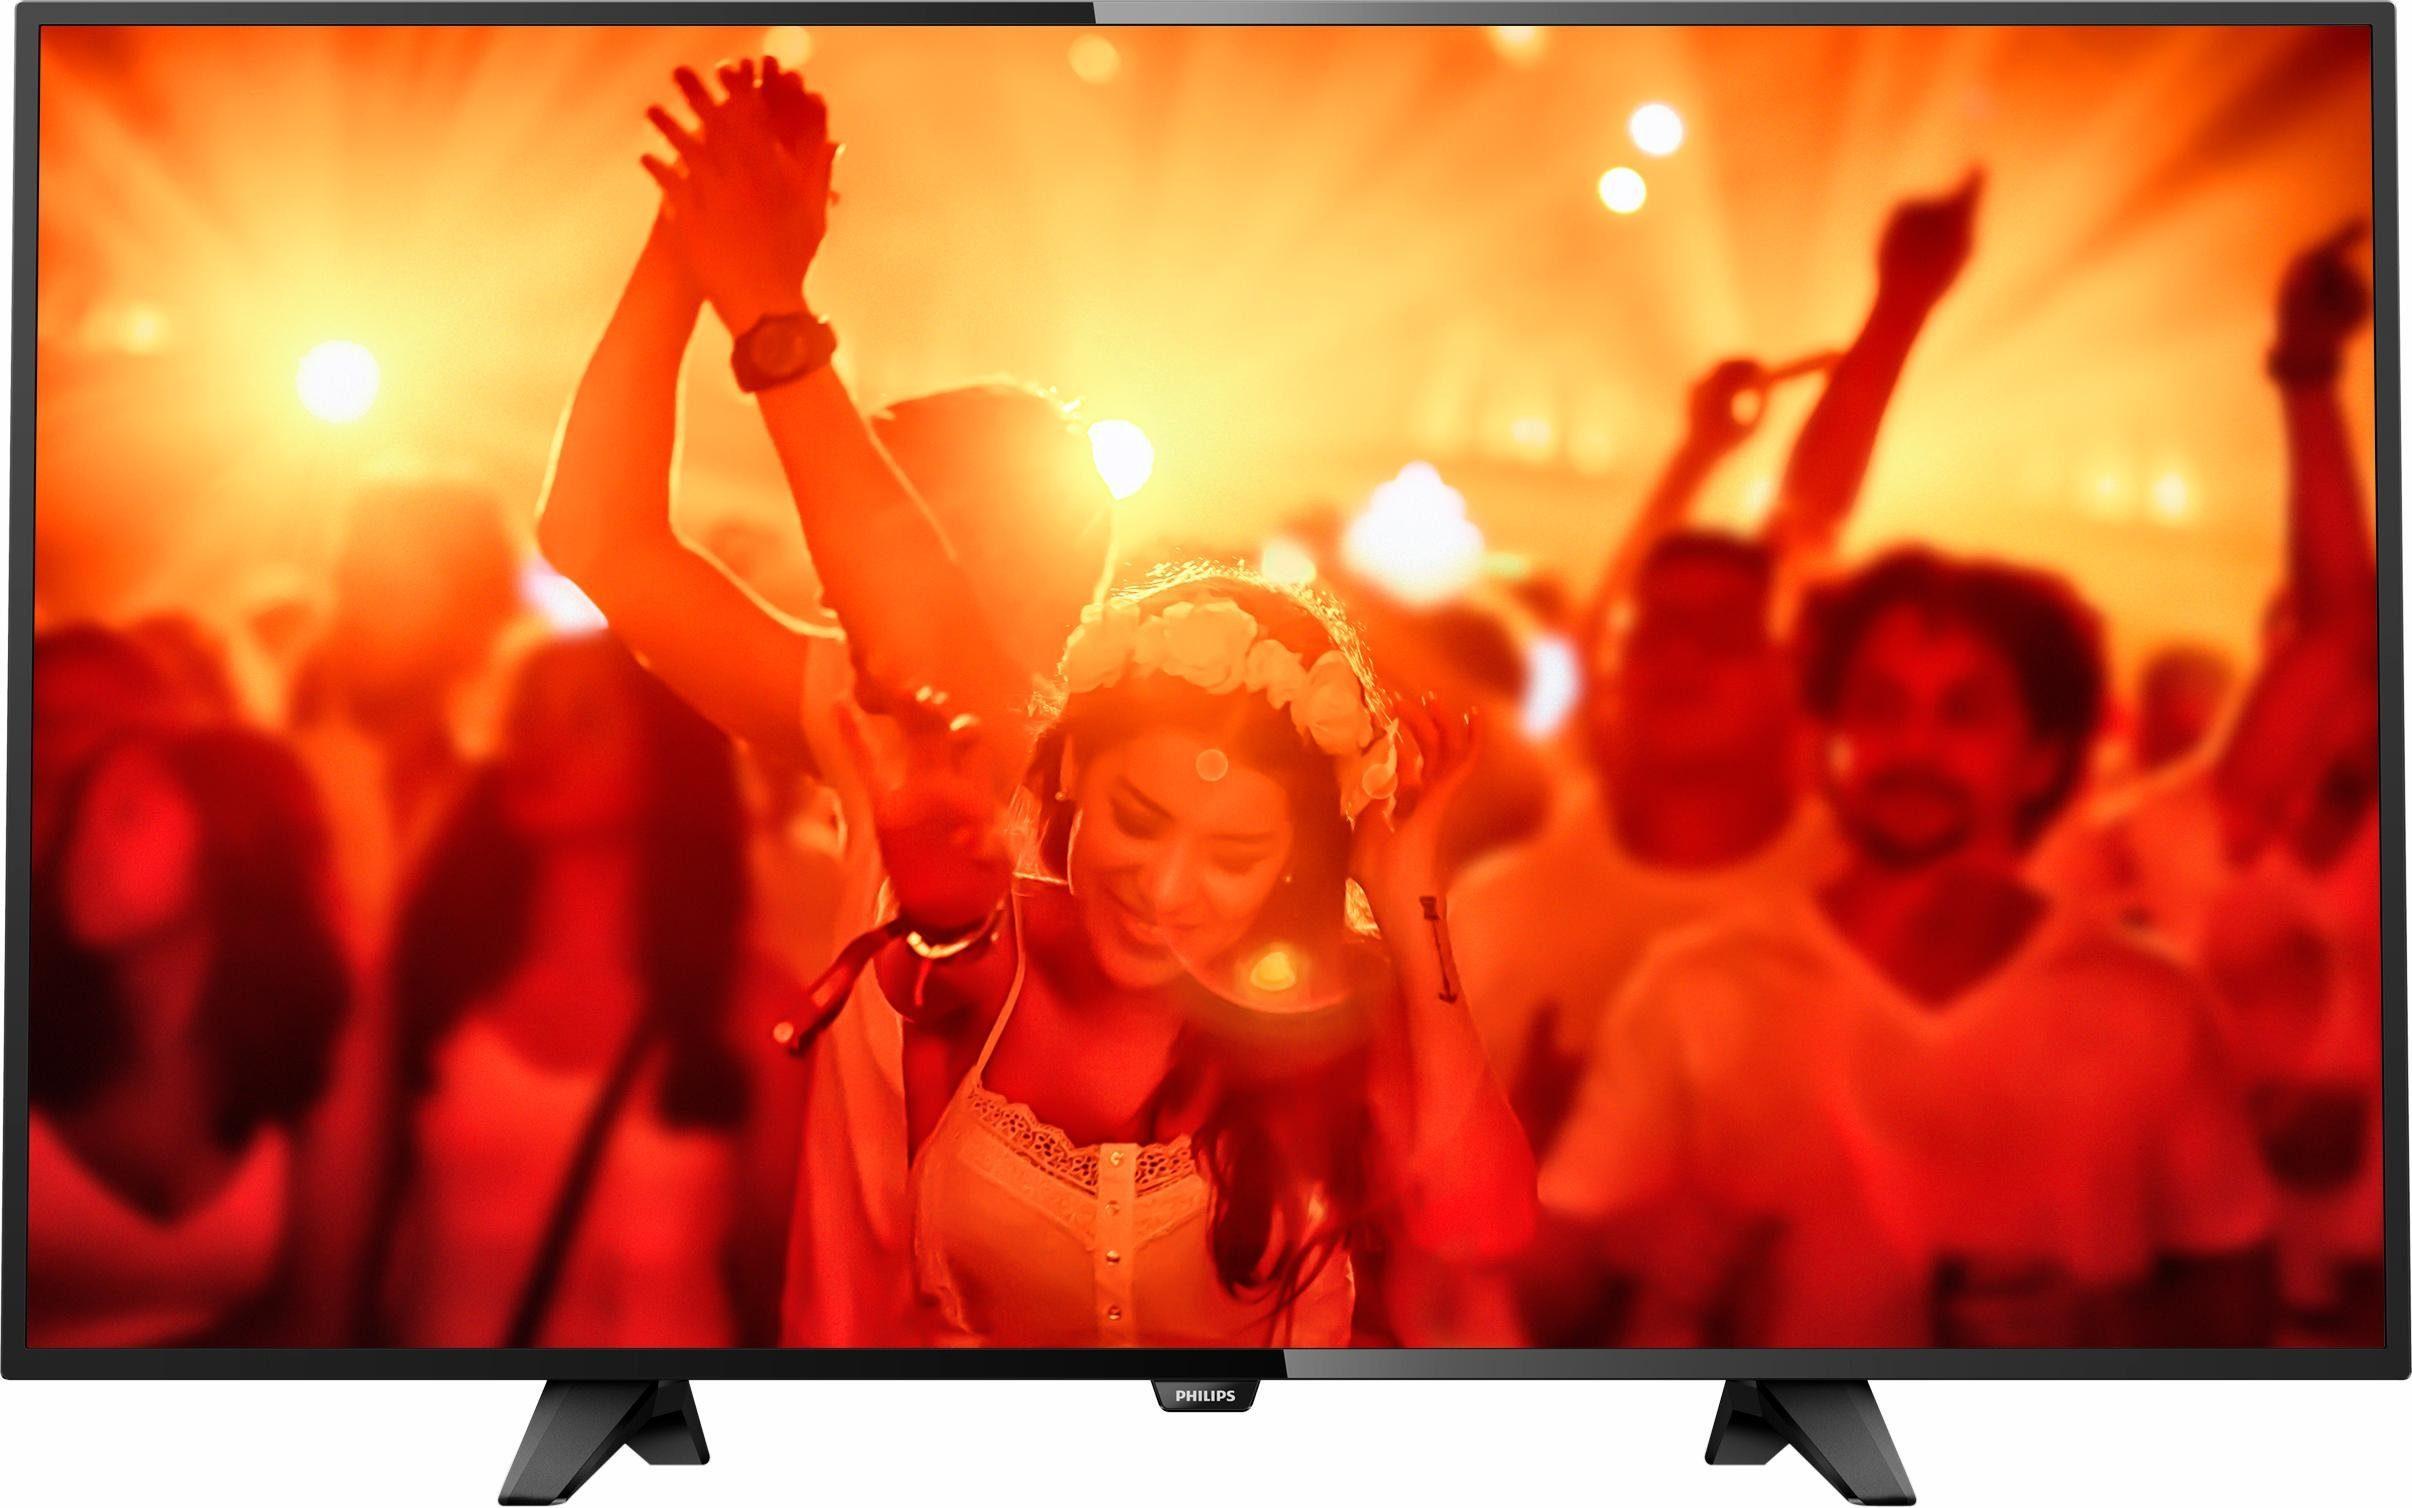 Philips 49PFS4131, LED Fernseher, 123 cm (49 Zoll), 1080p (Full HD)